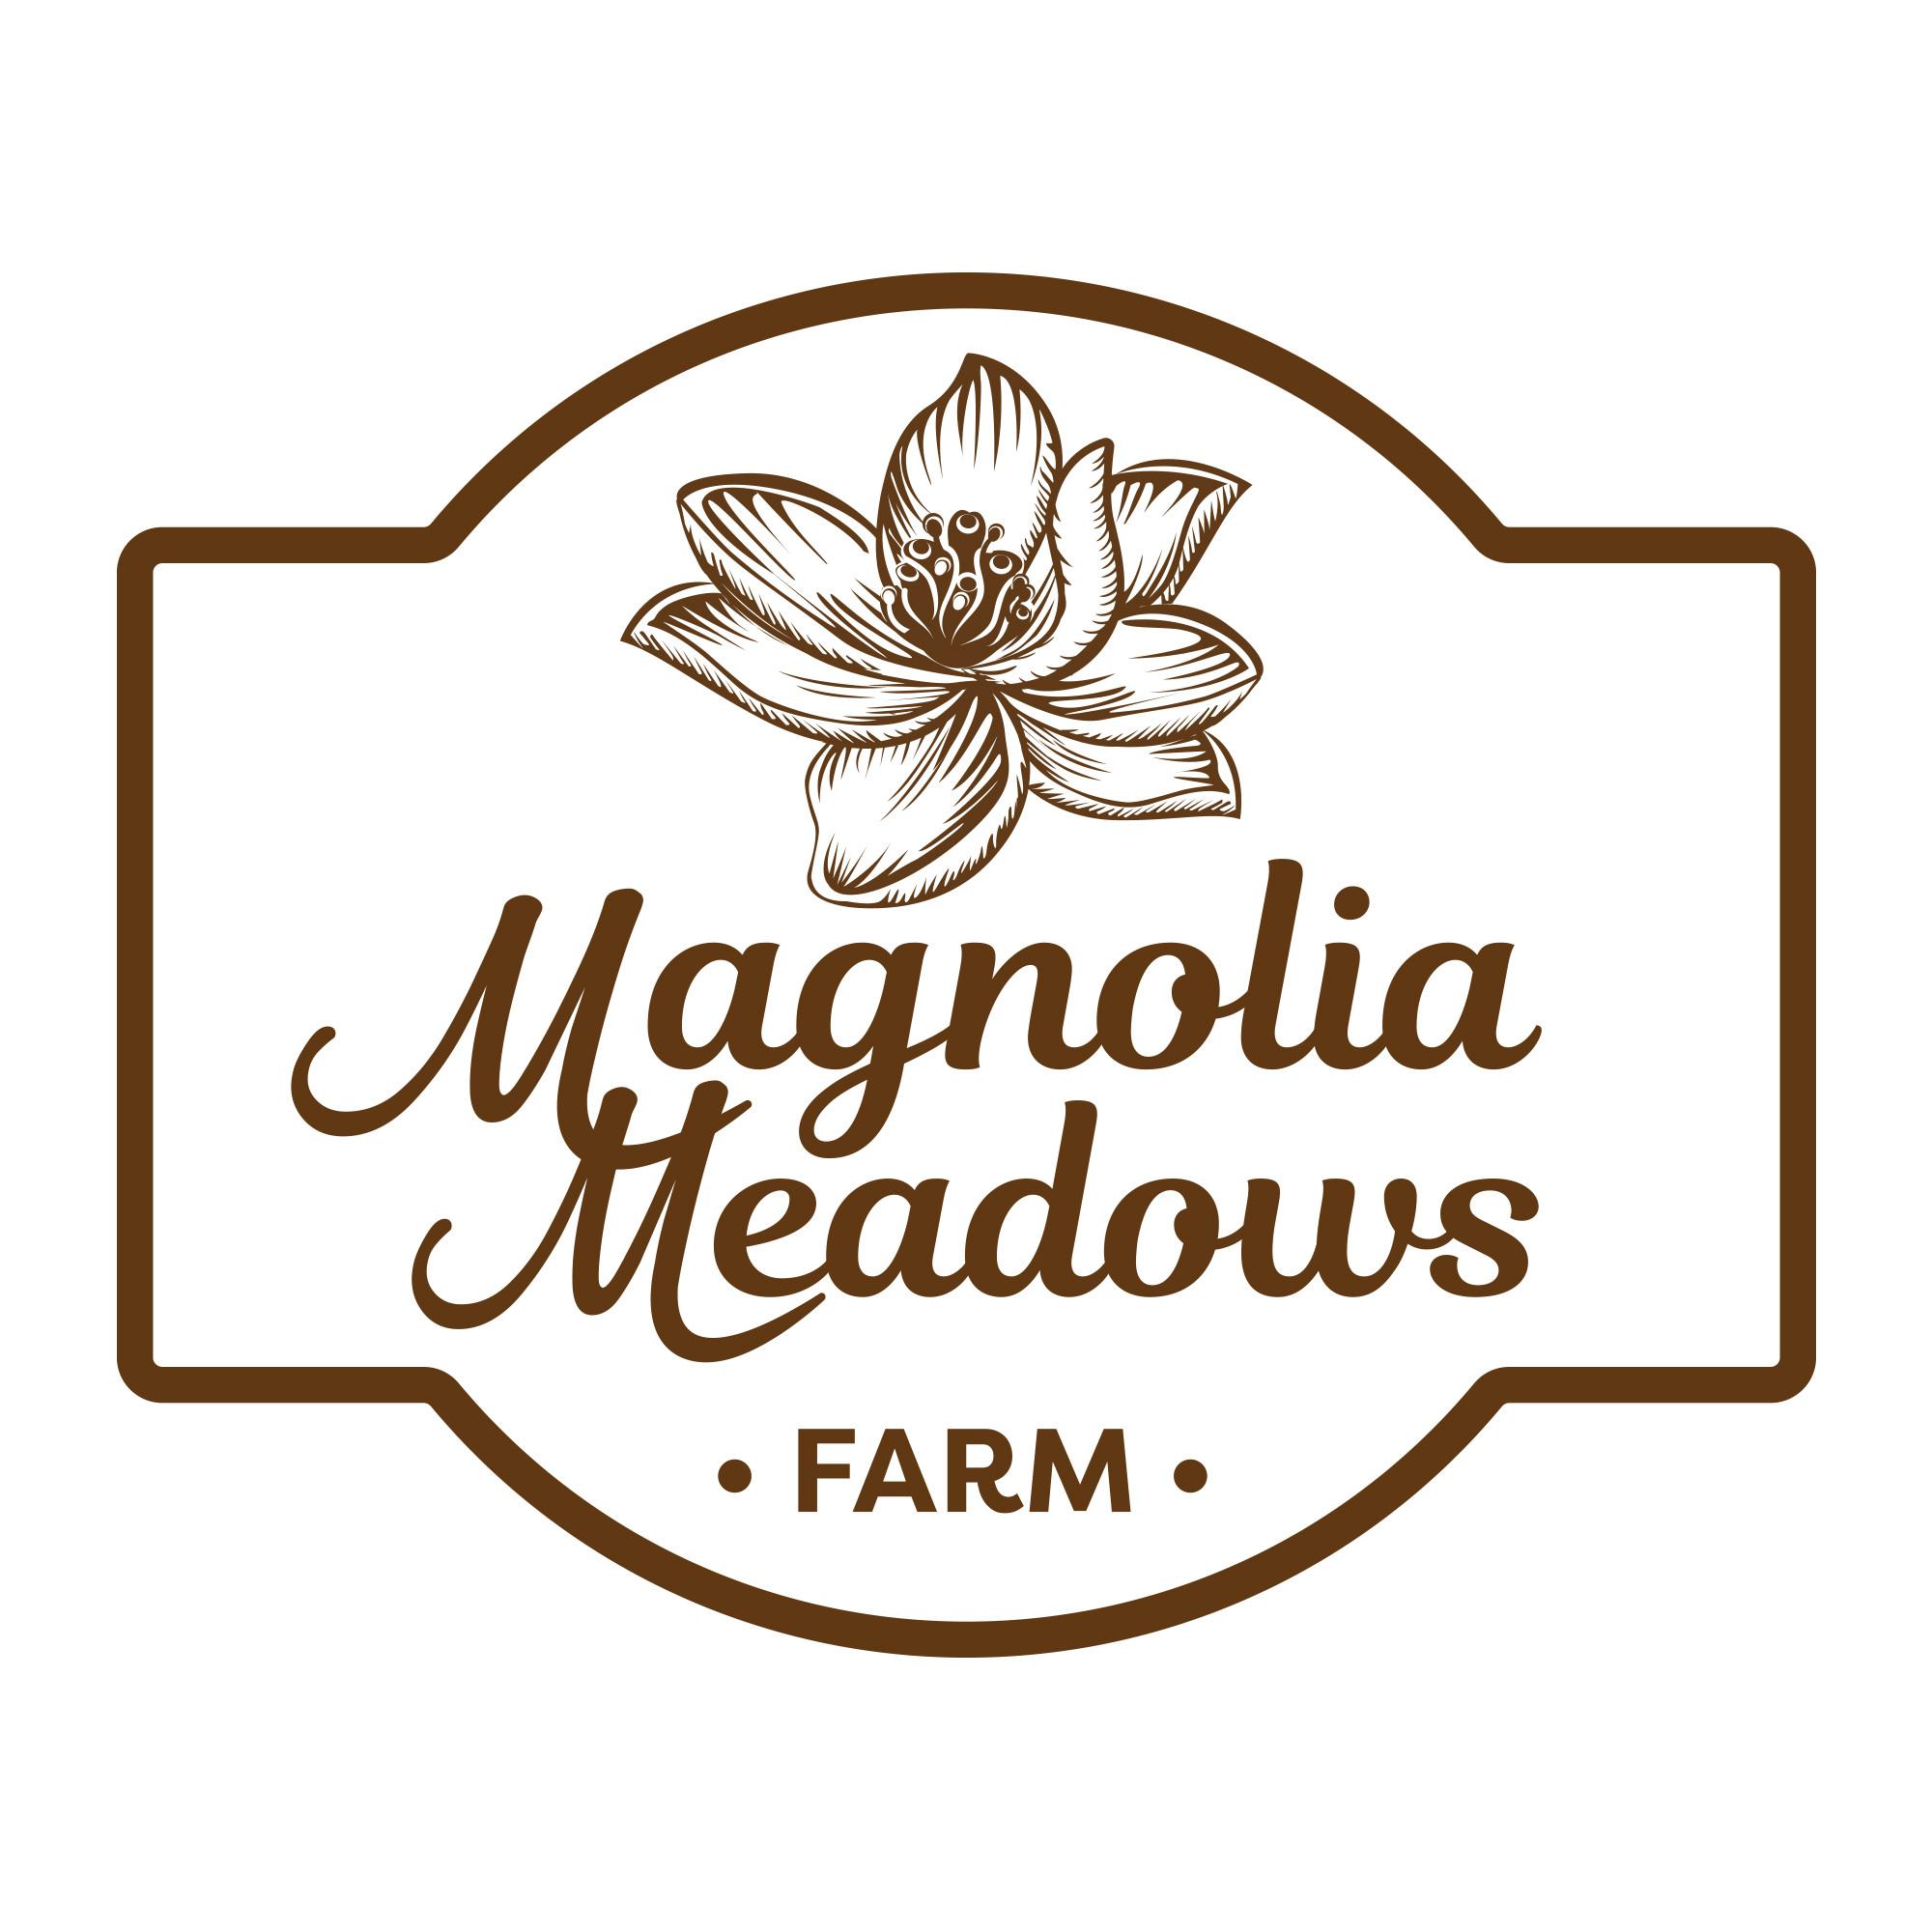 Magnolia Meadows Farm Logo